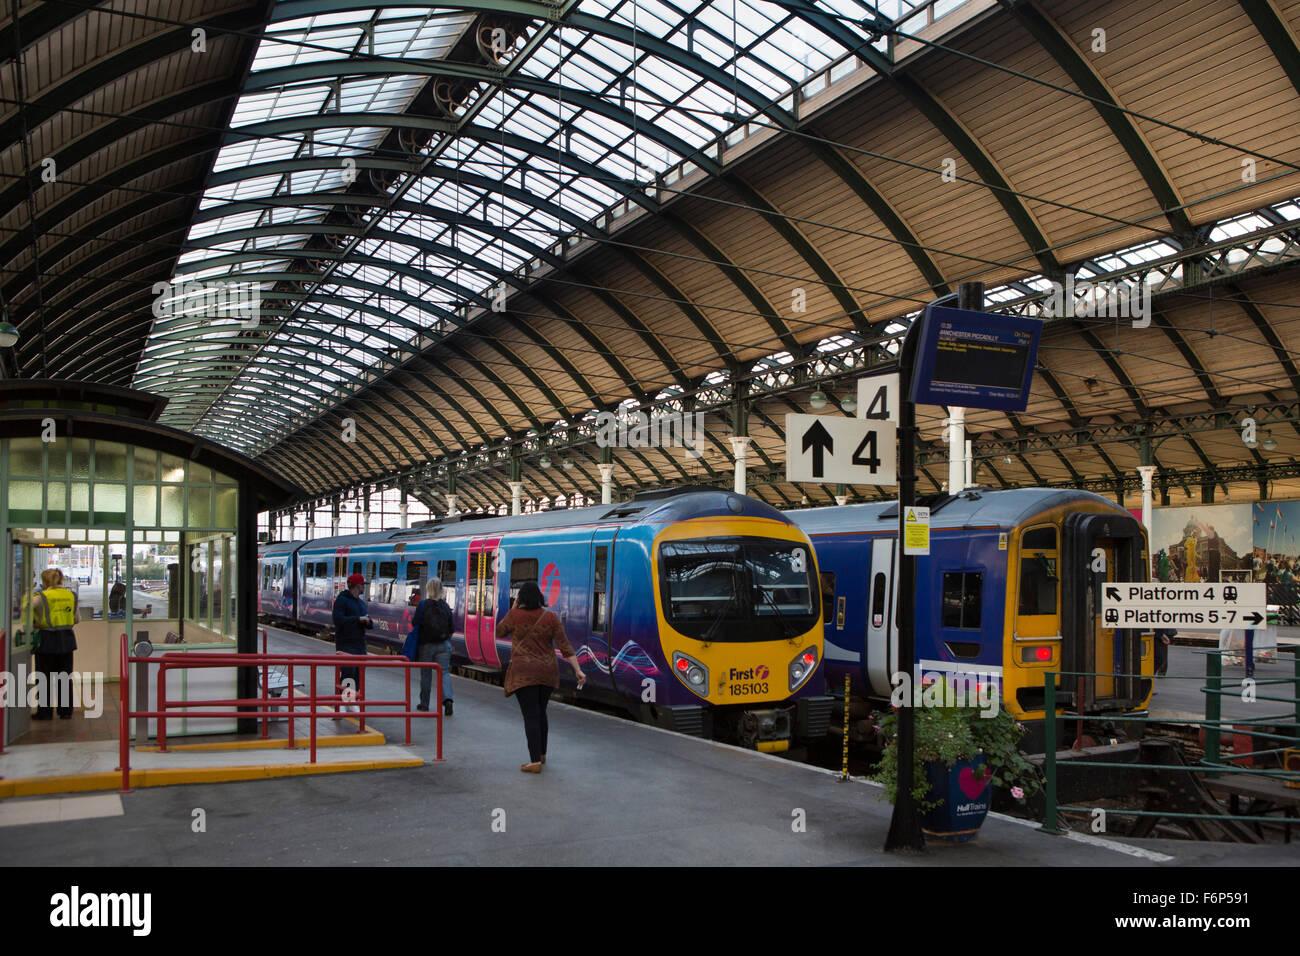 UK, England, Yorkshire, Hull, Railway Station, First Transpennine train at platform - Stock Image